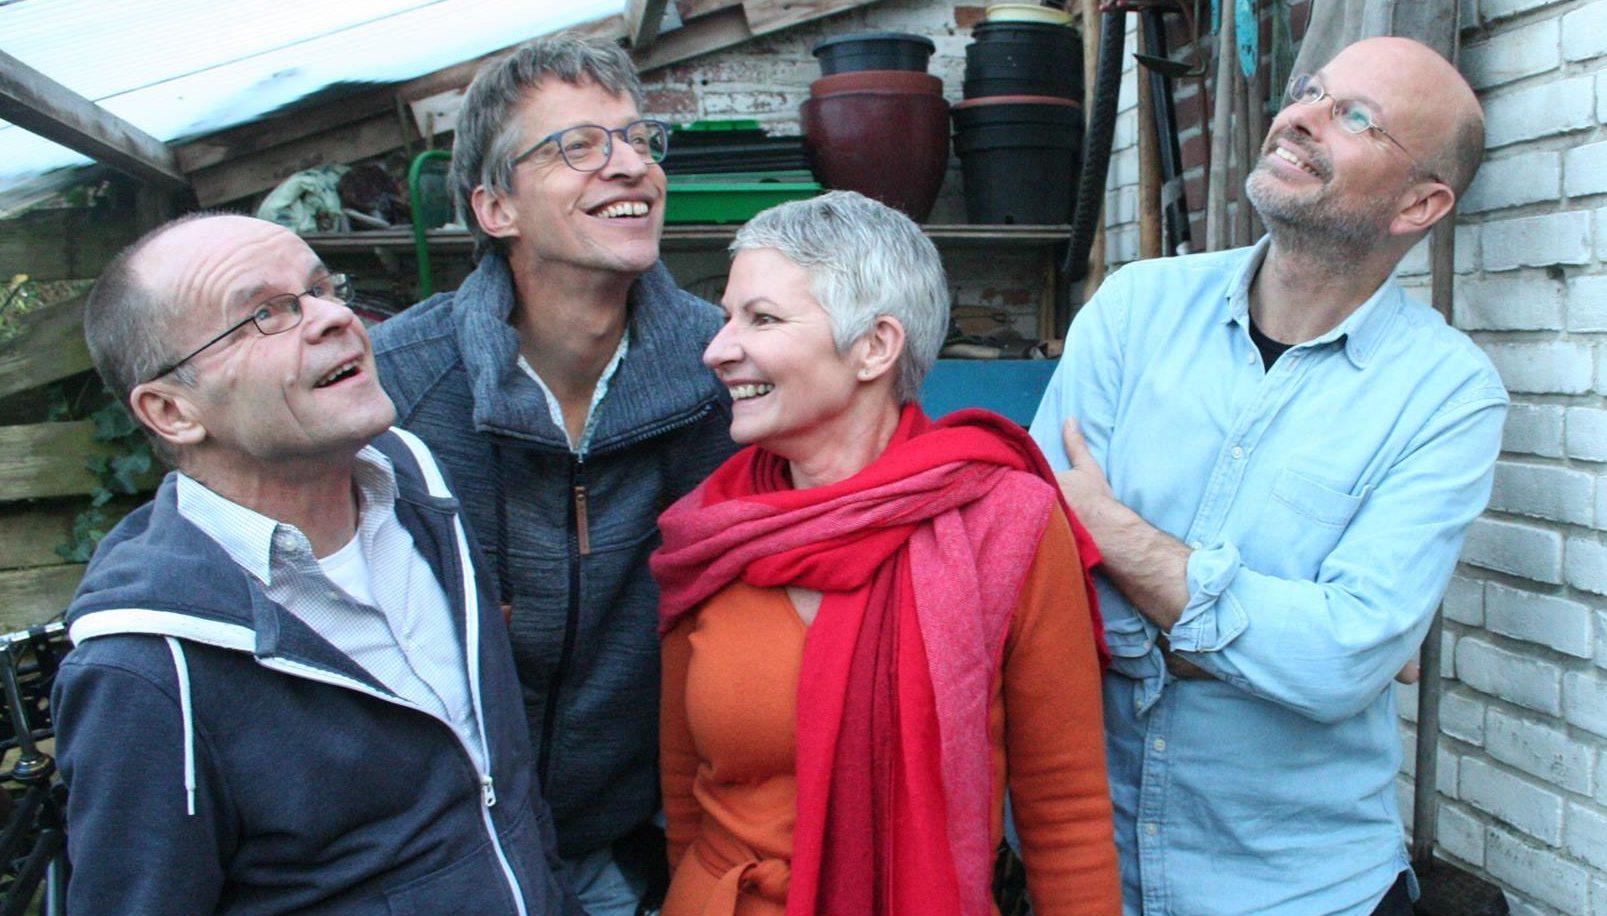 Joli Cuer: Rex et Regina @ De Amersfoortse Zwaan